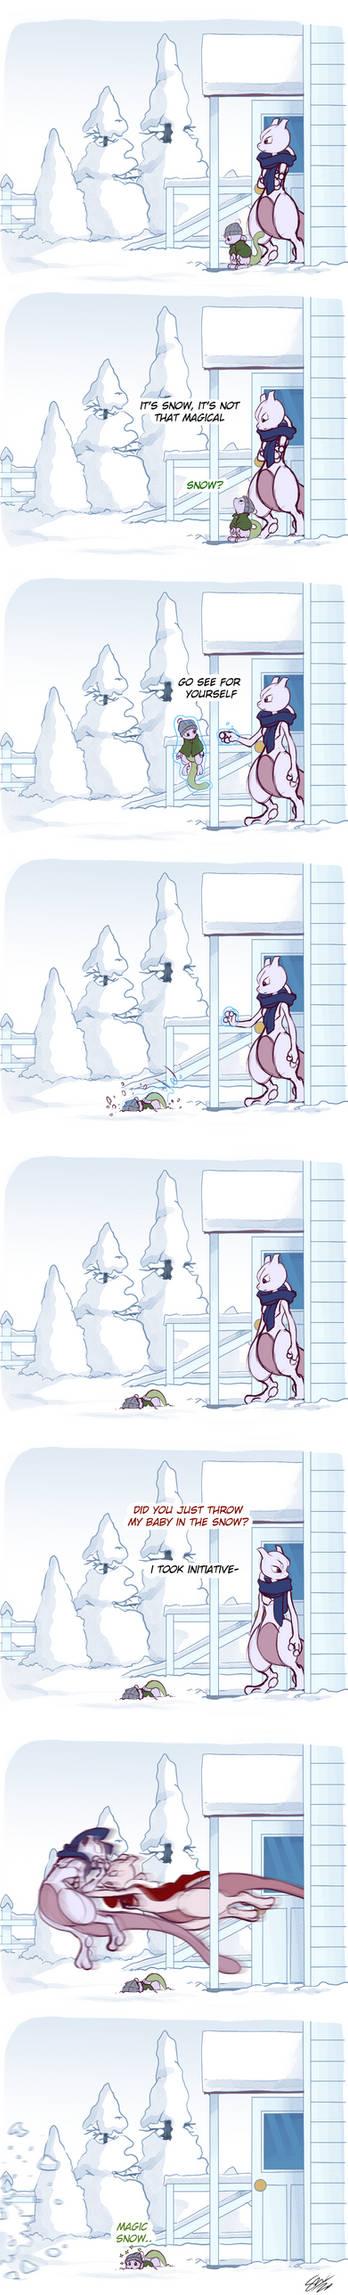 Huey's First Snow